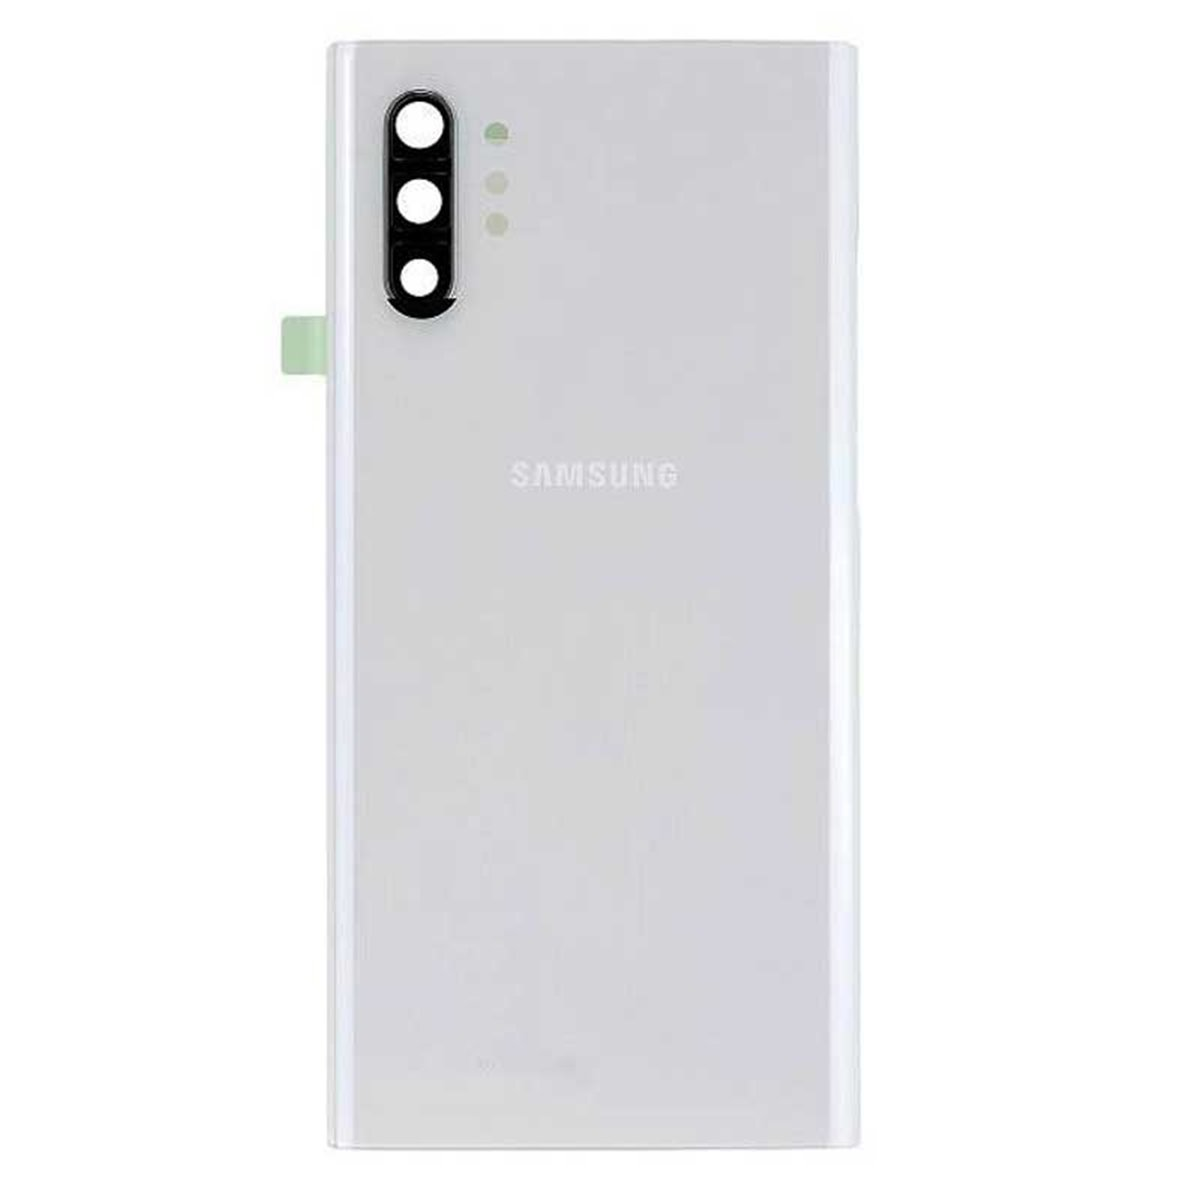 Tapa trasera Samsung Galaxy Note 10 Plus N975 Blanco (aura white)